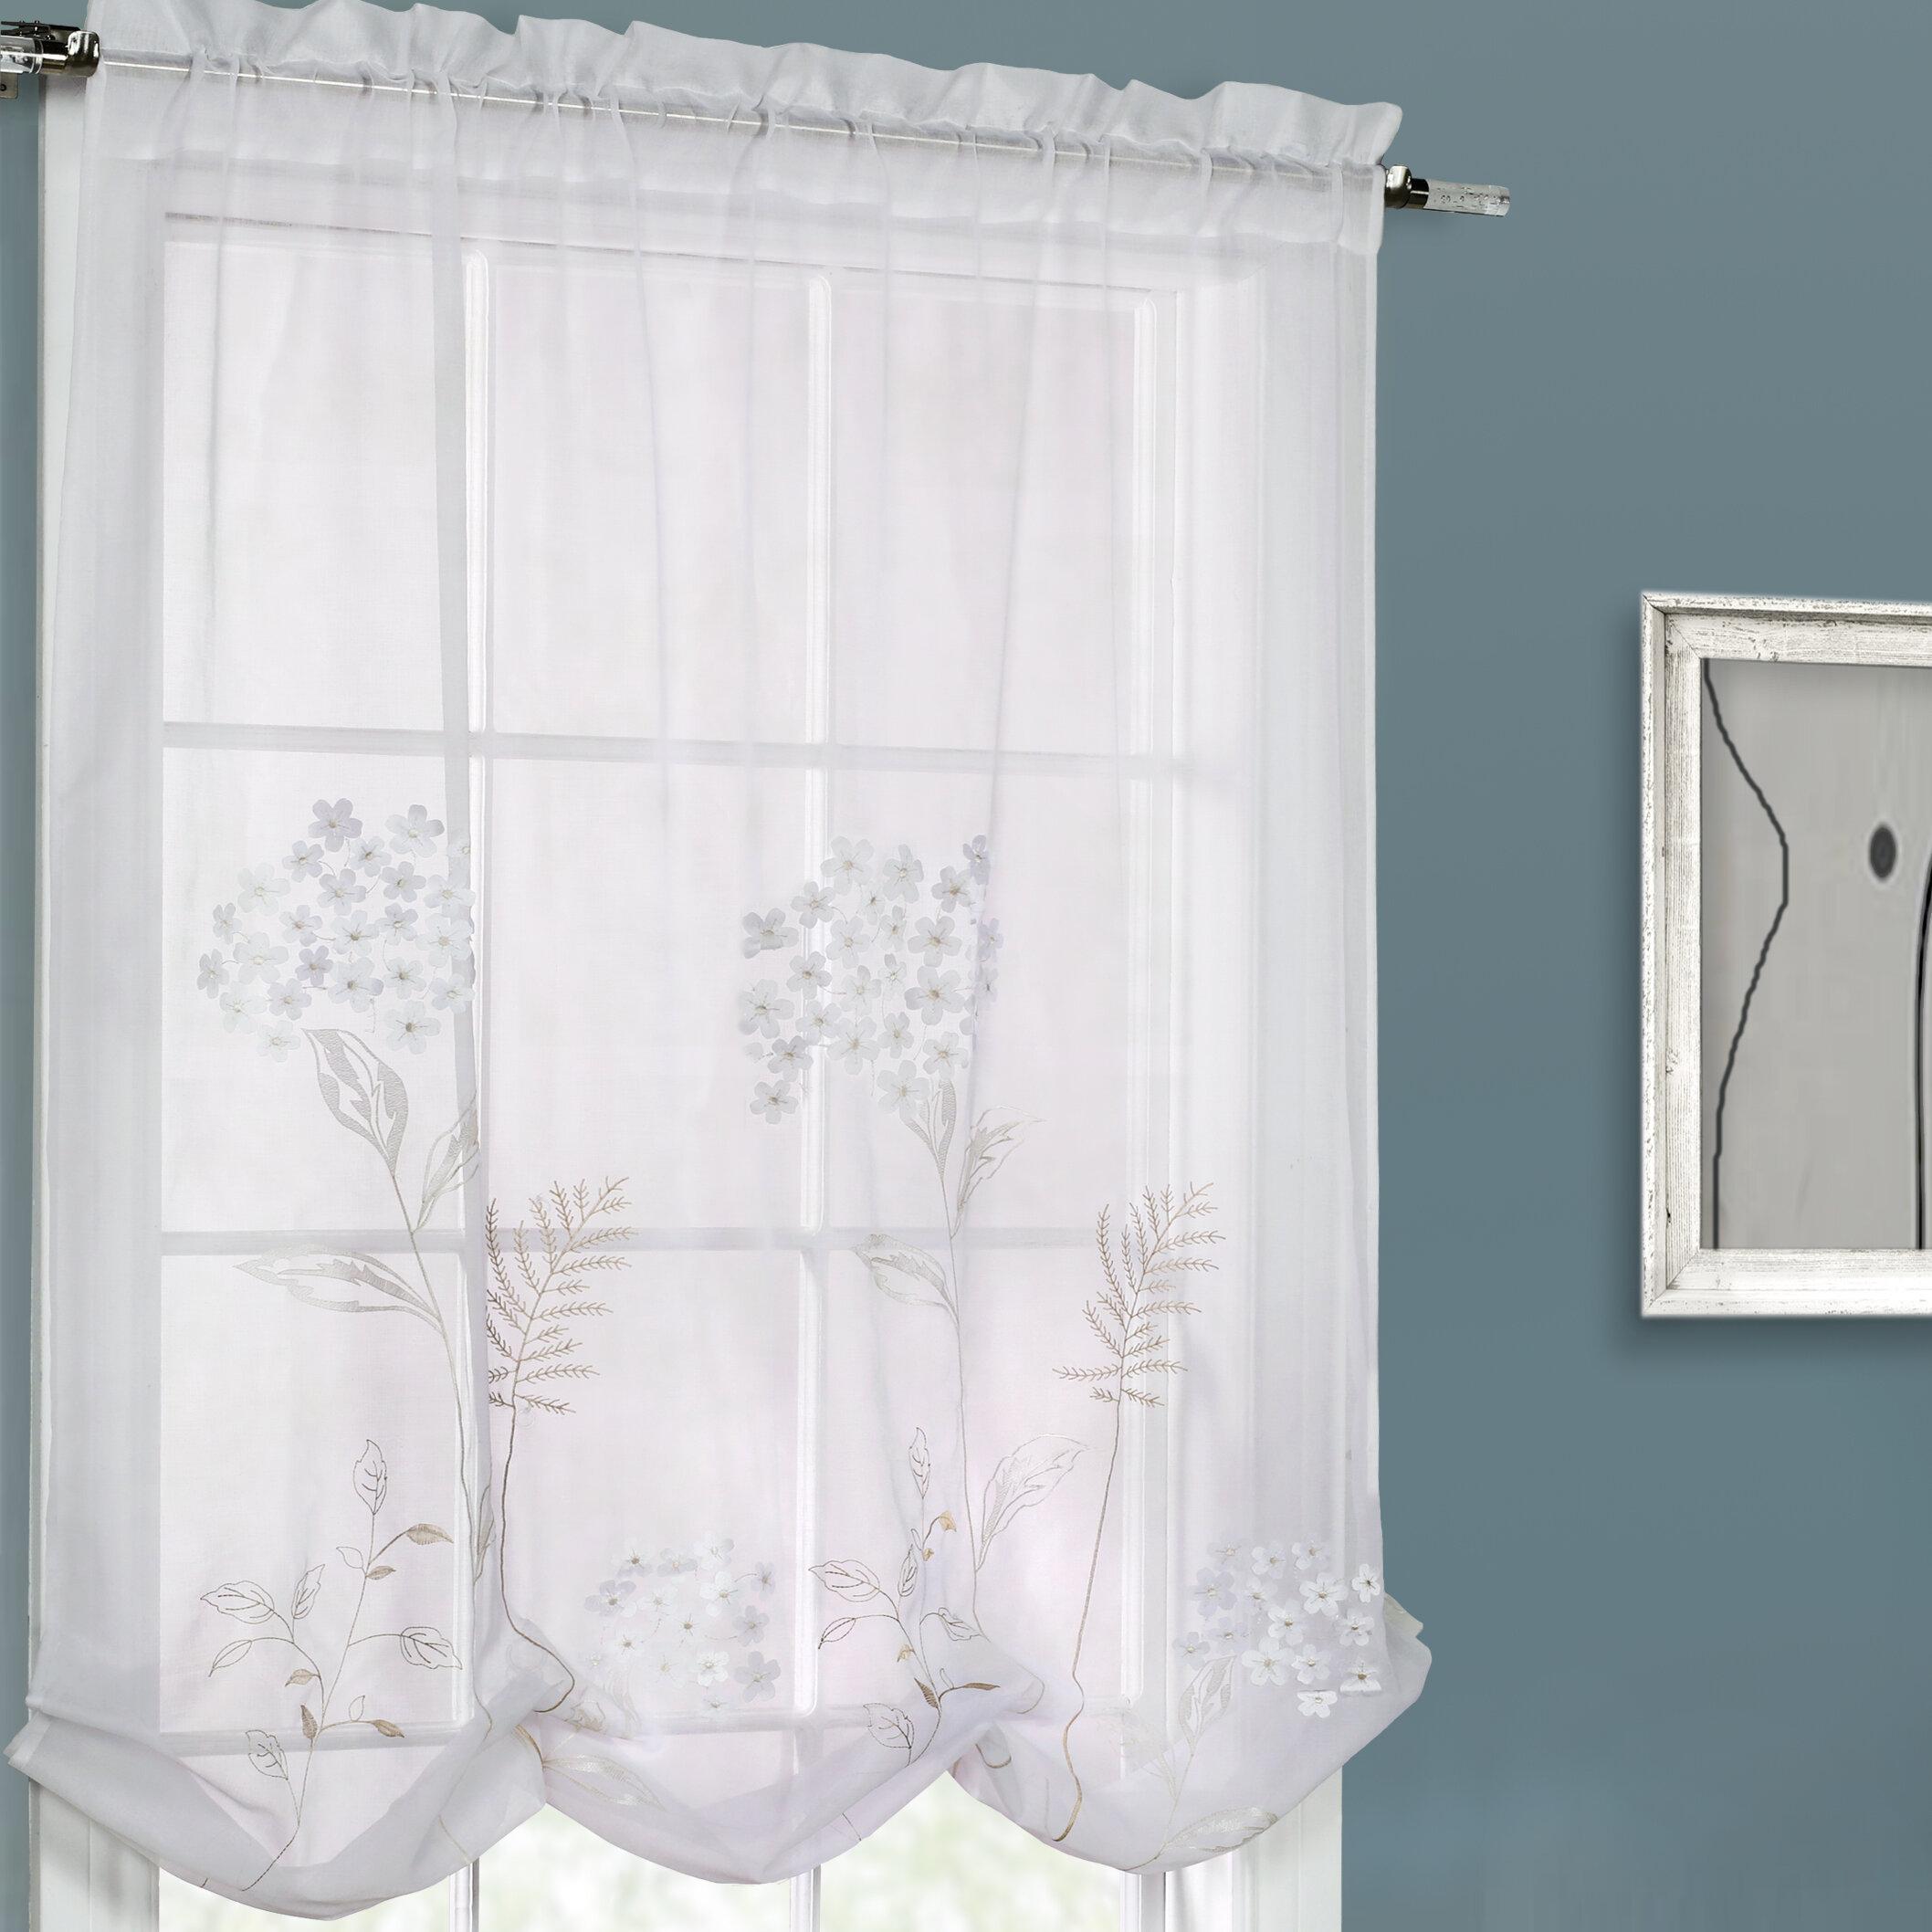 Ordinaire August Grove Irenee Adjustable Window Tie Up Shade U0026 Reviews | Wayfair